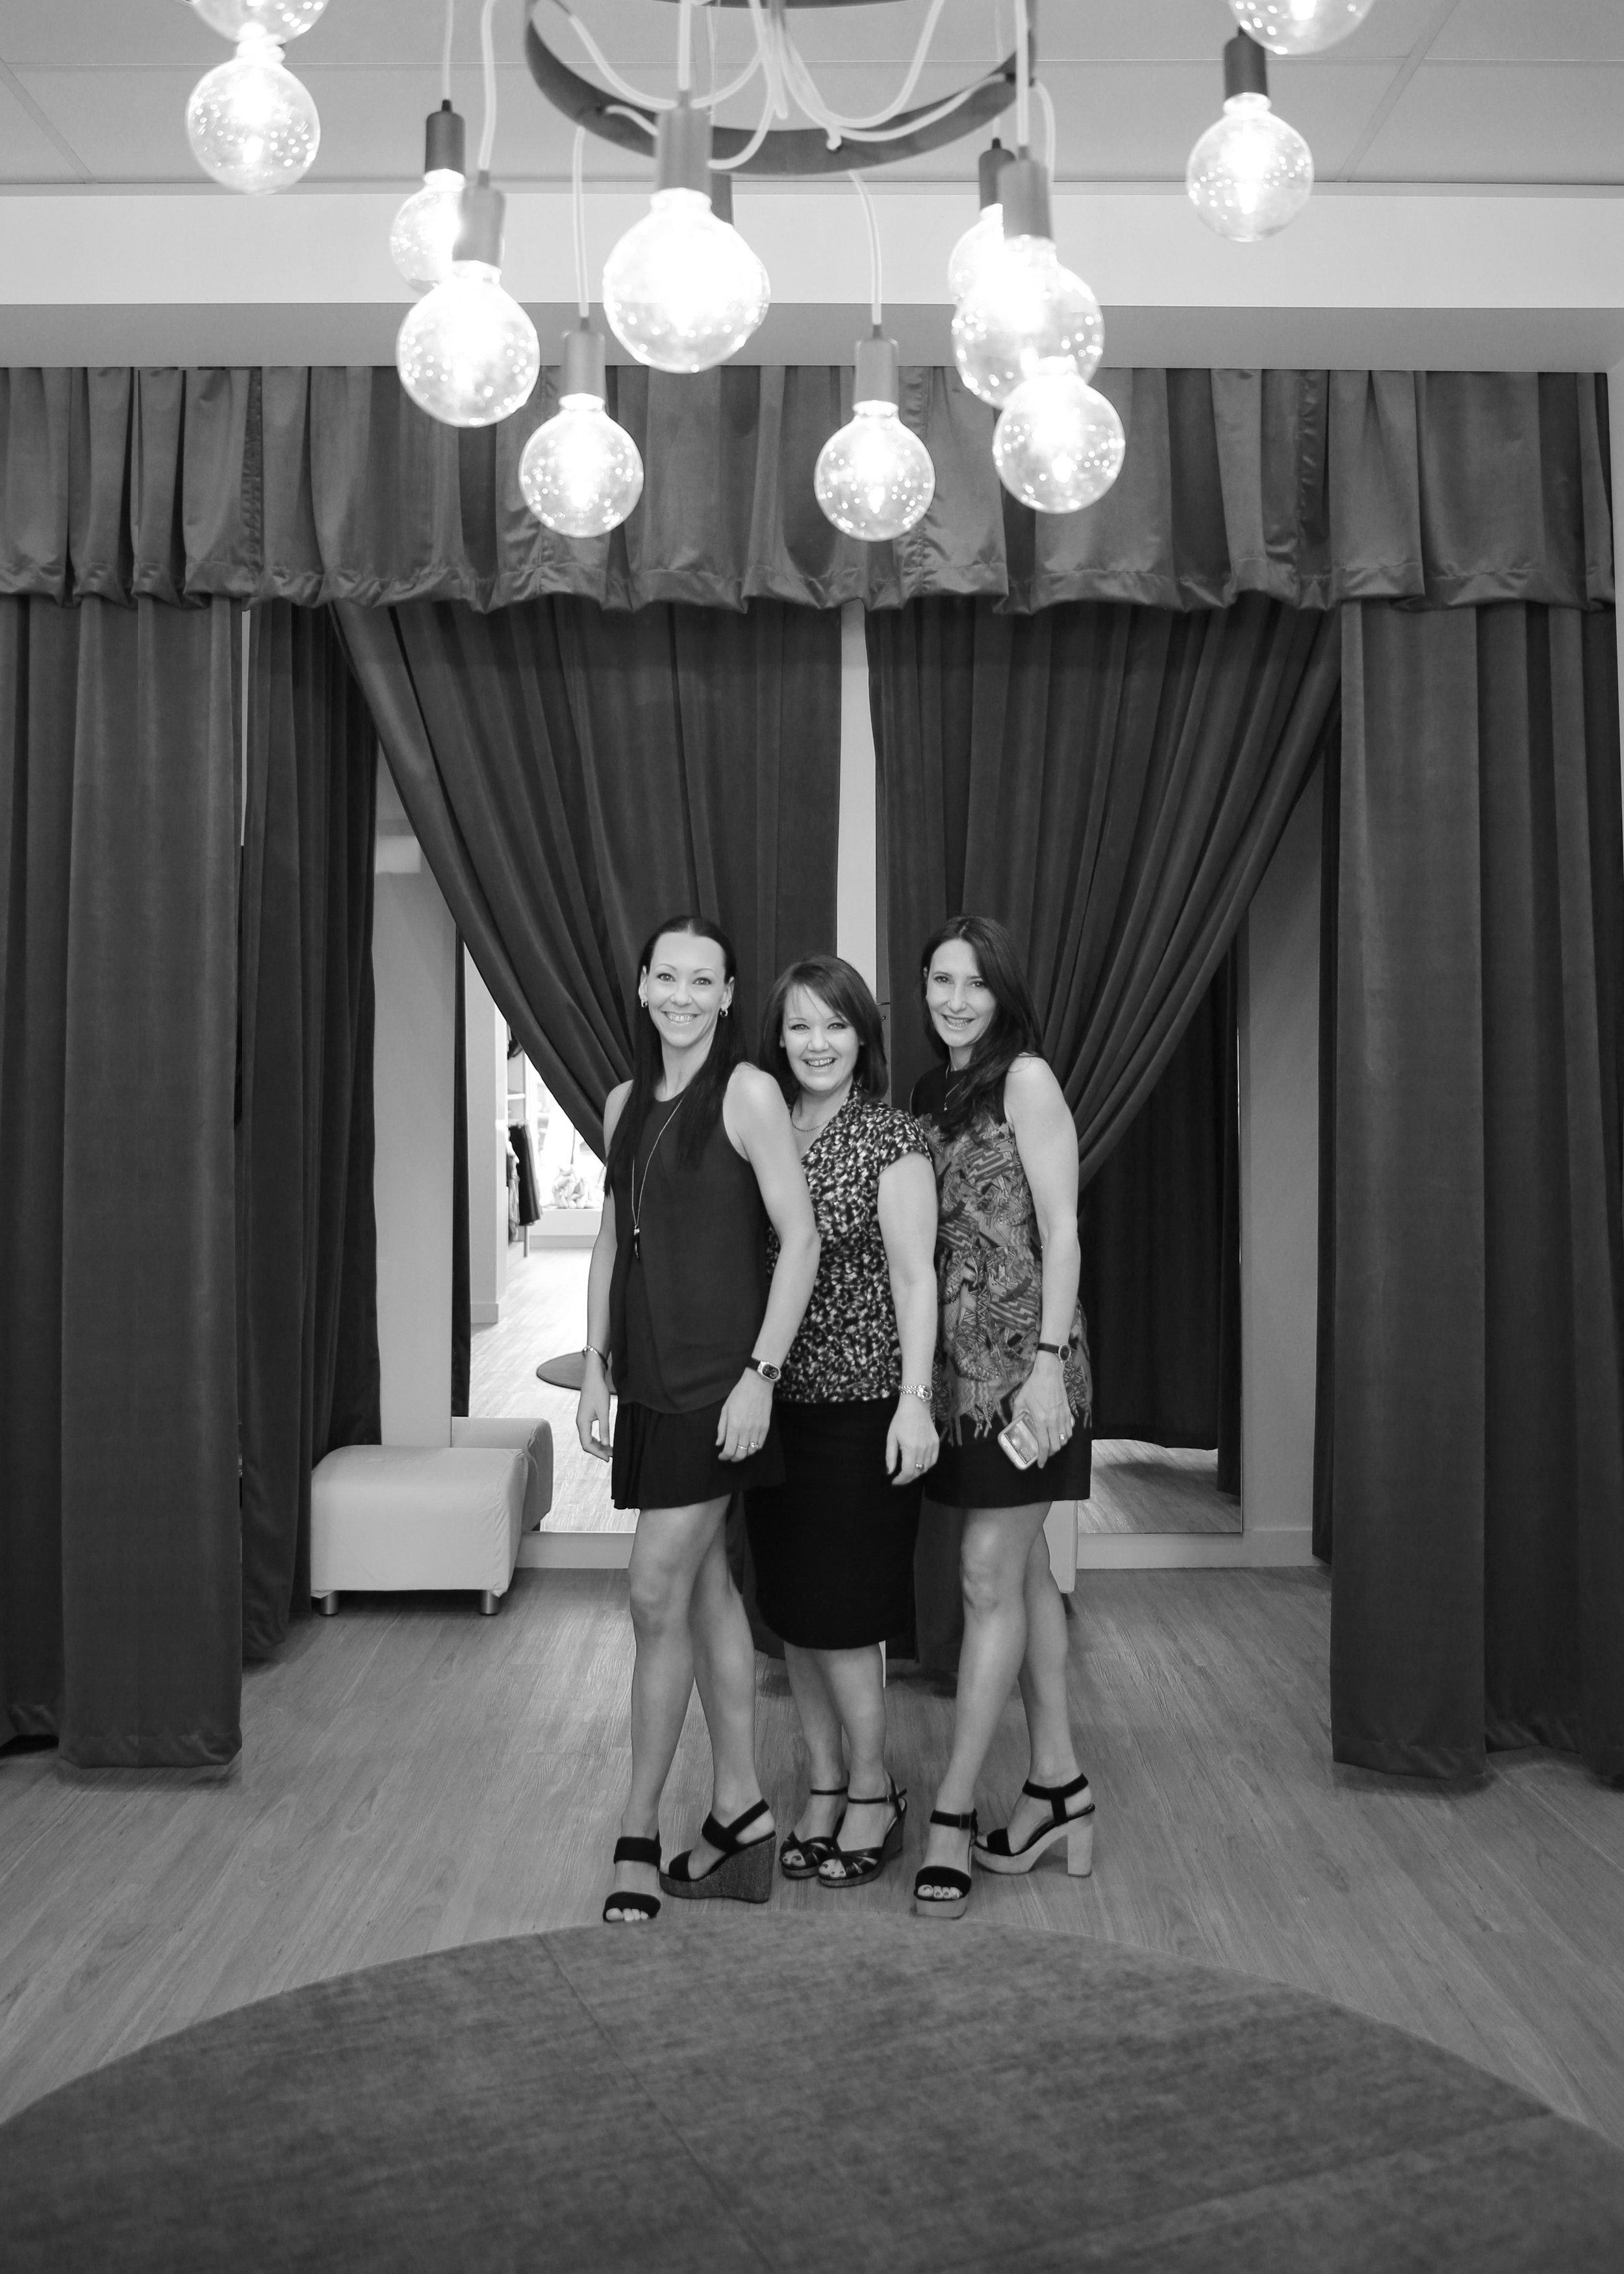 Lynda, Gail and Karen at the opening of Energetiks Ivanhoe